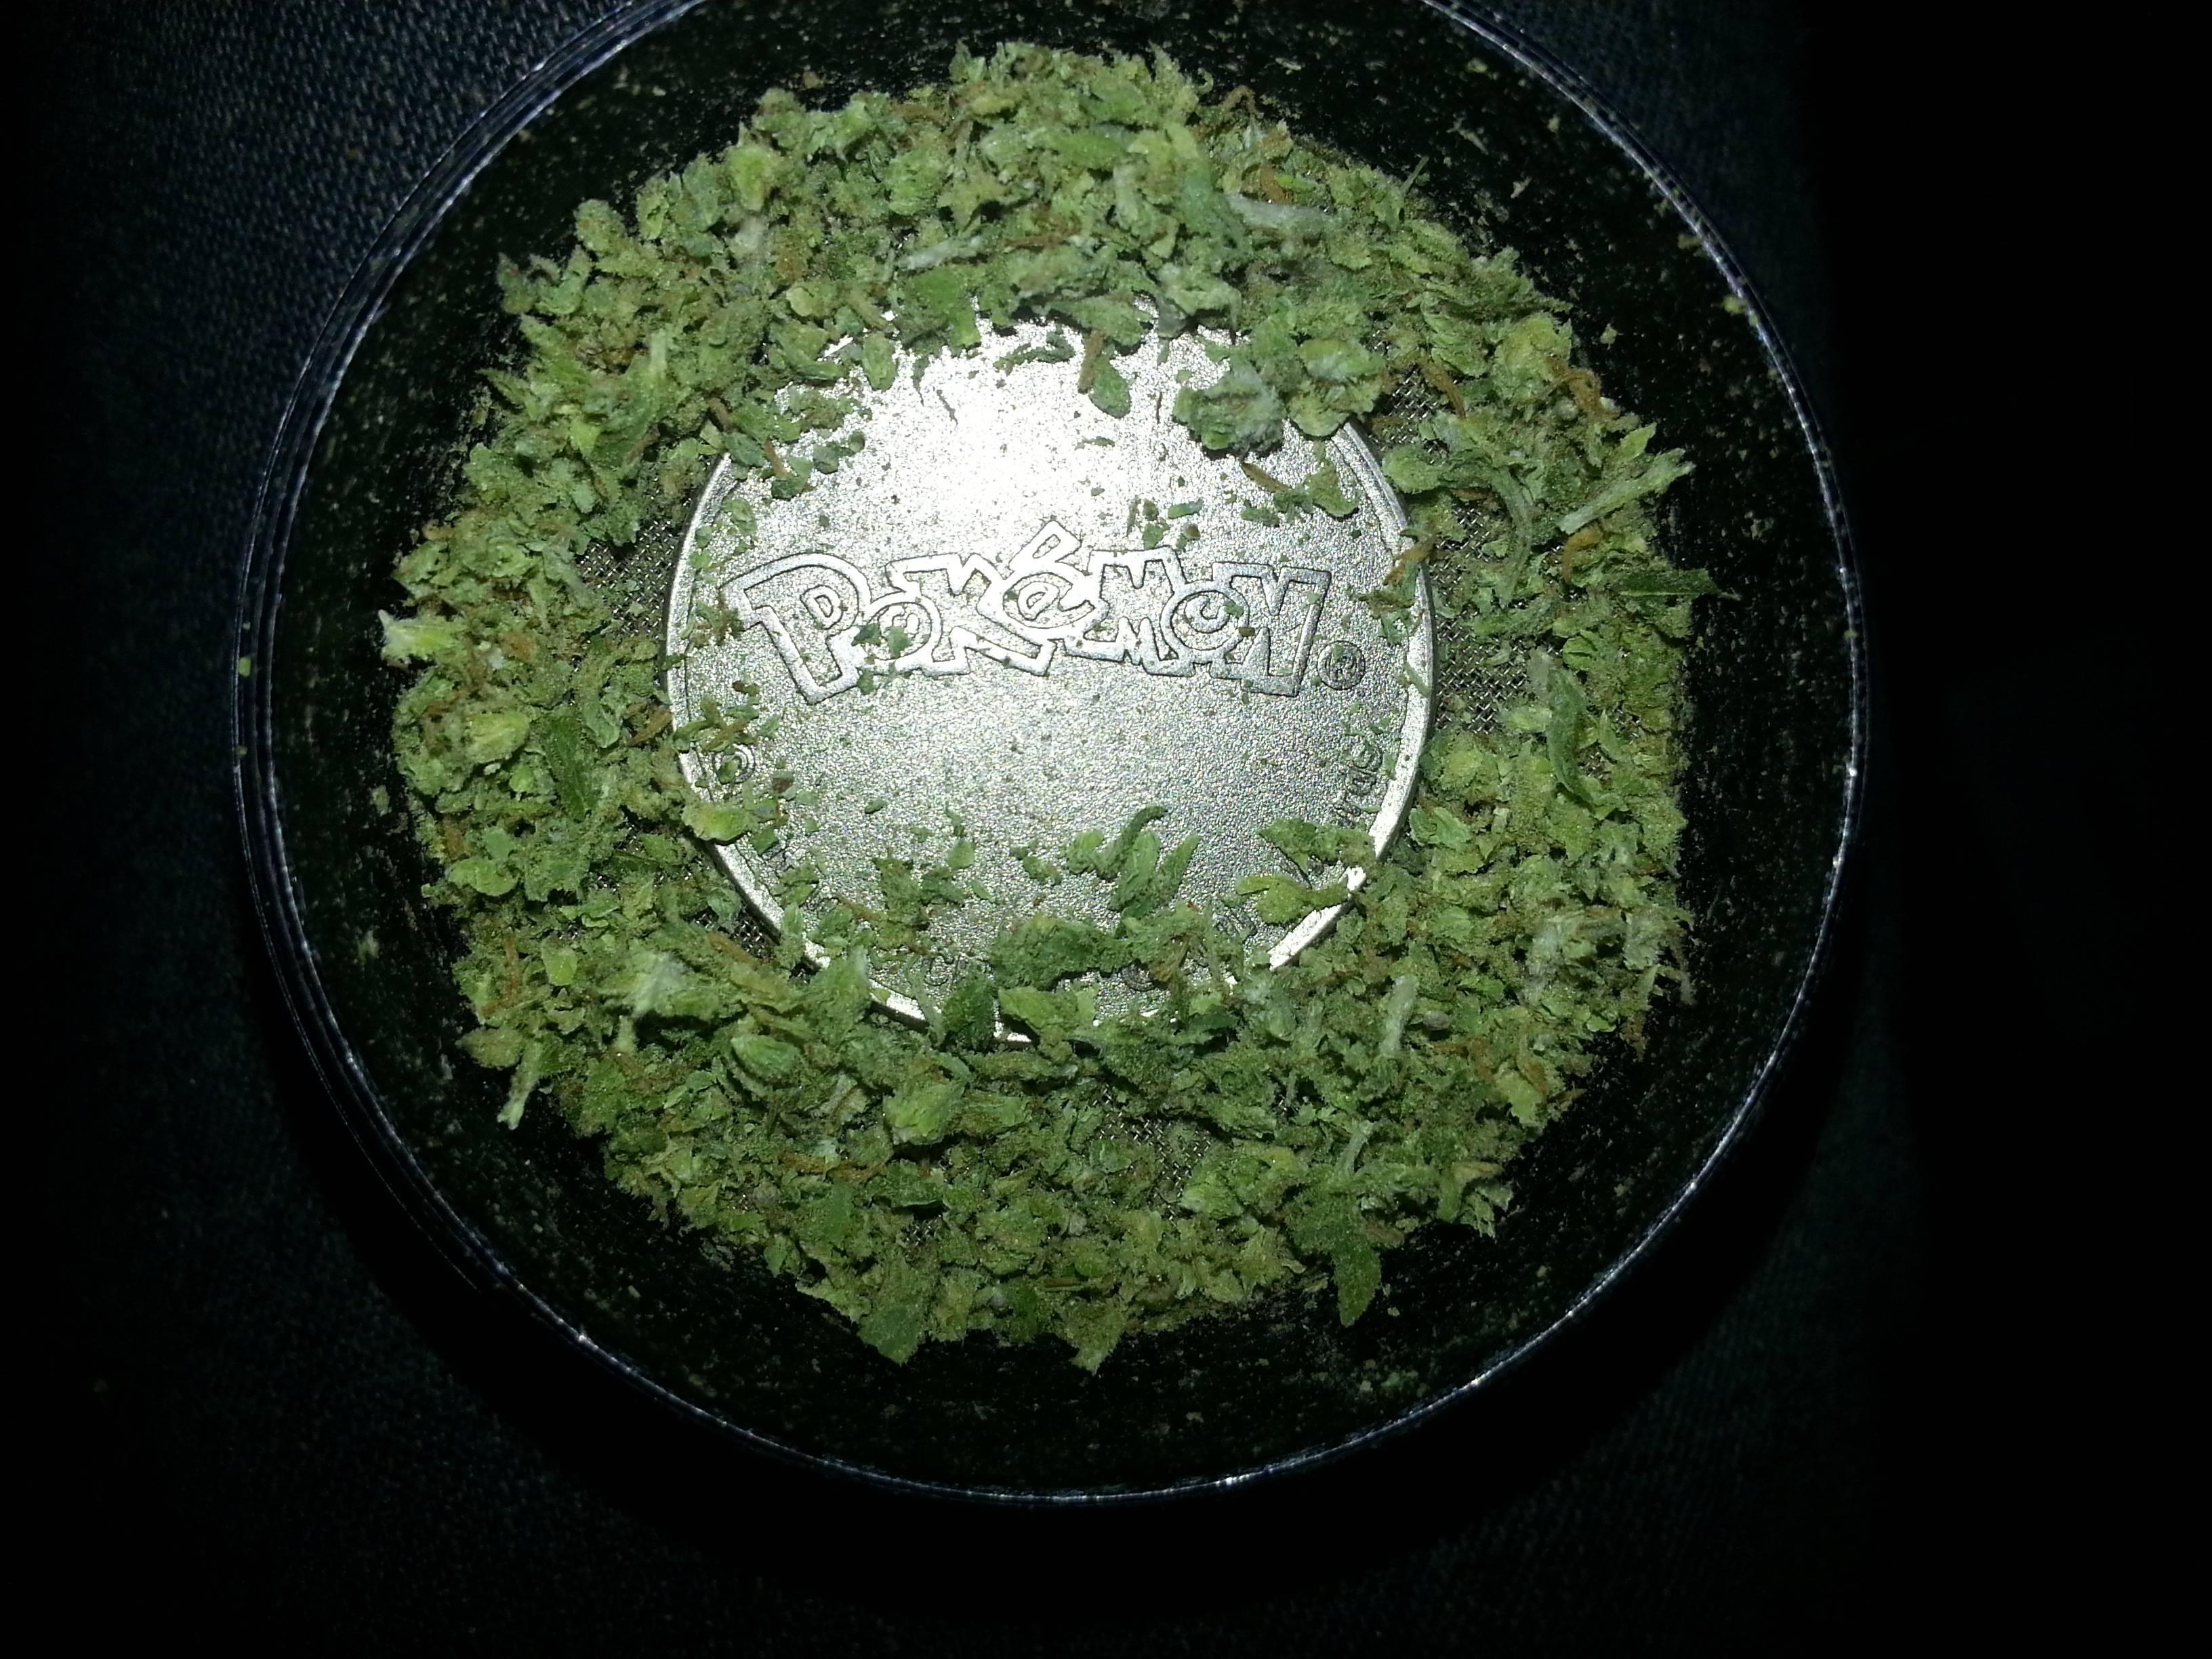 http://cannabiscorner.net/wp-content/uploads/2017/09/ZCz0xaM.jpg